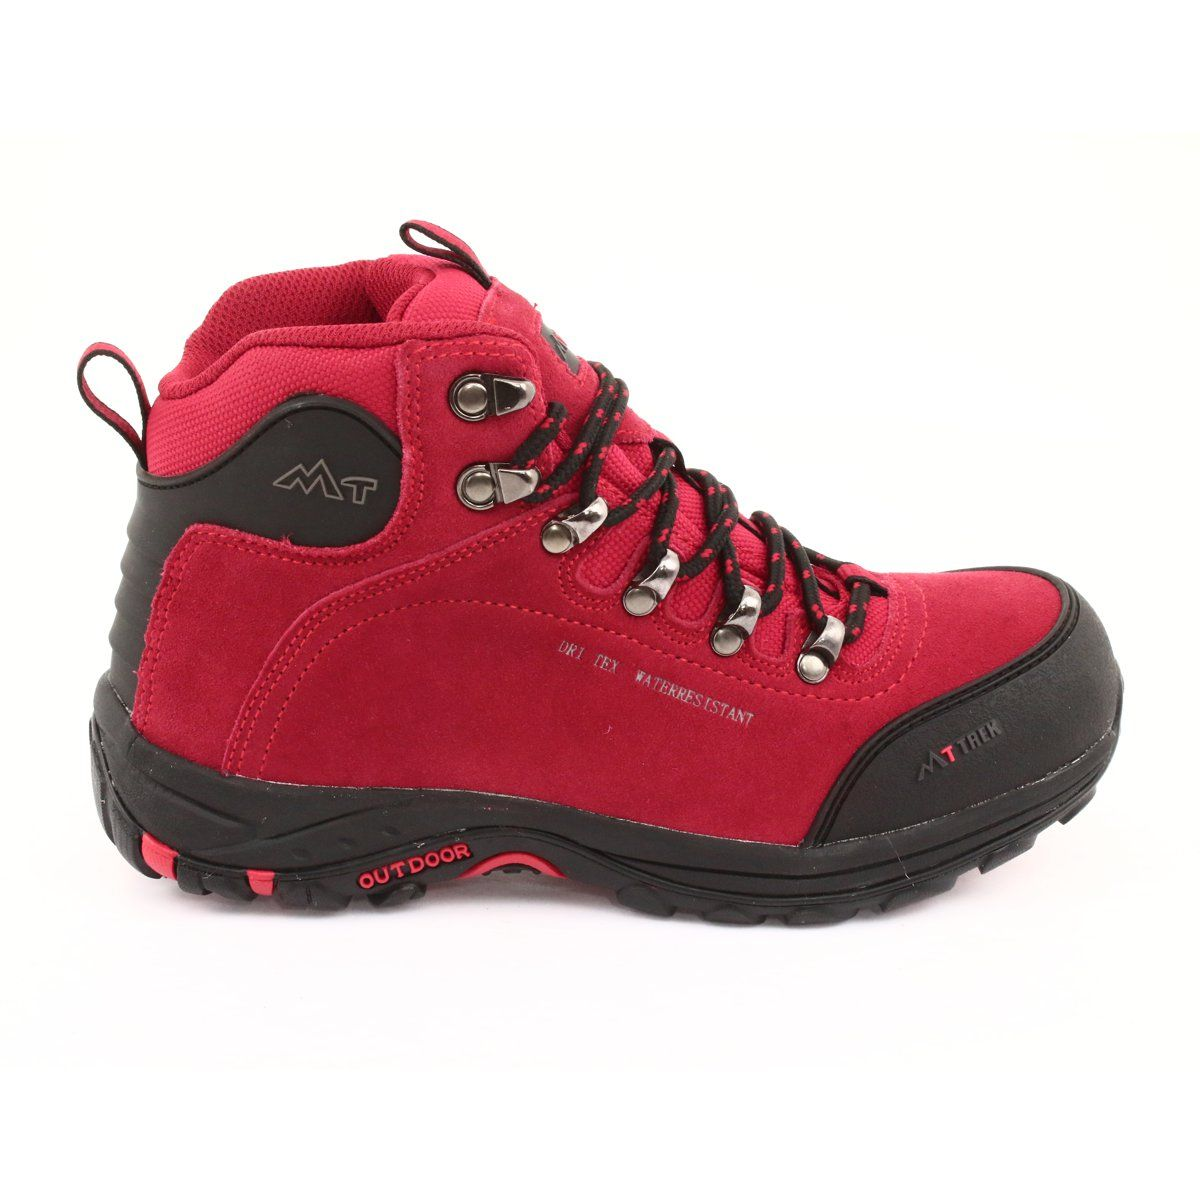 Trapery Z Membrana Mttrek 034 Red Czarne Czerwone Womens Athletic Shoes Trekking Shoes Black And Red